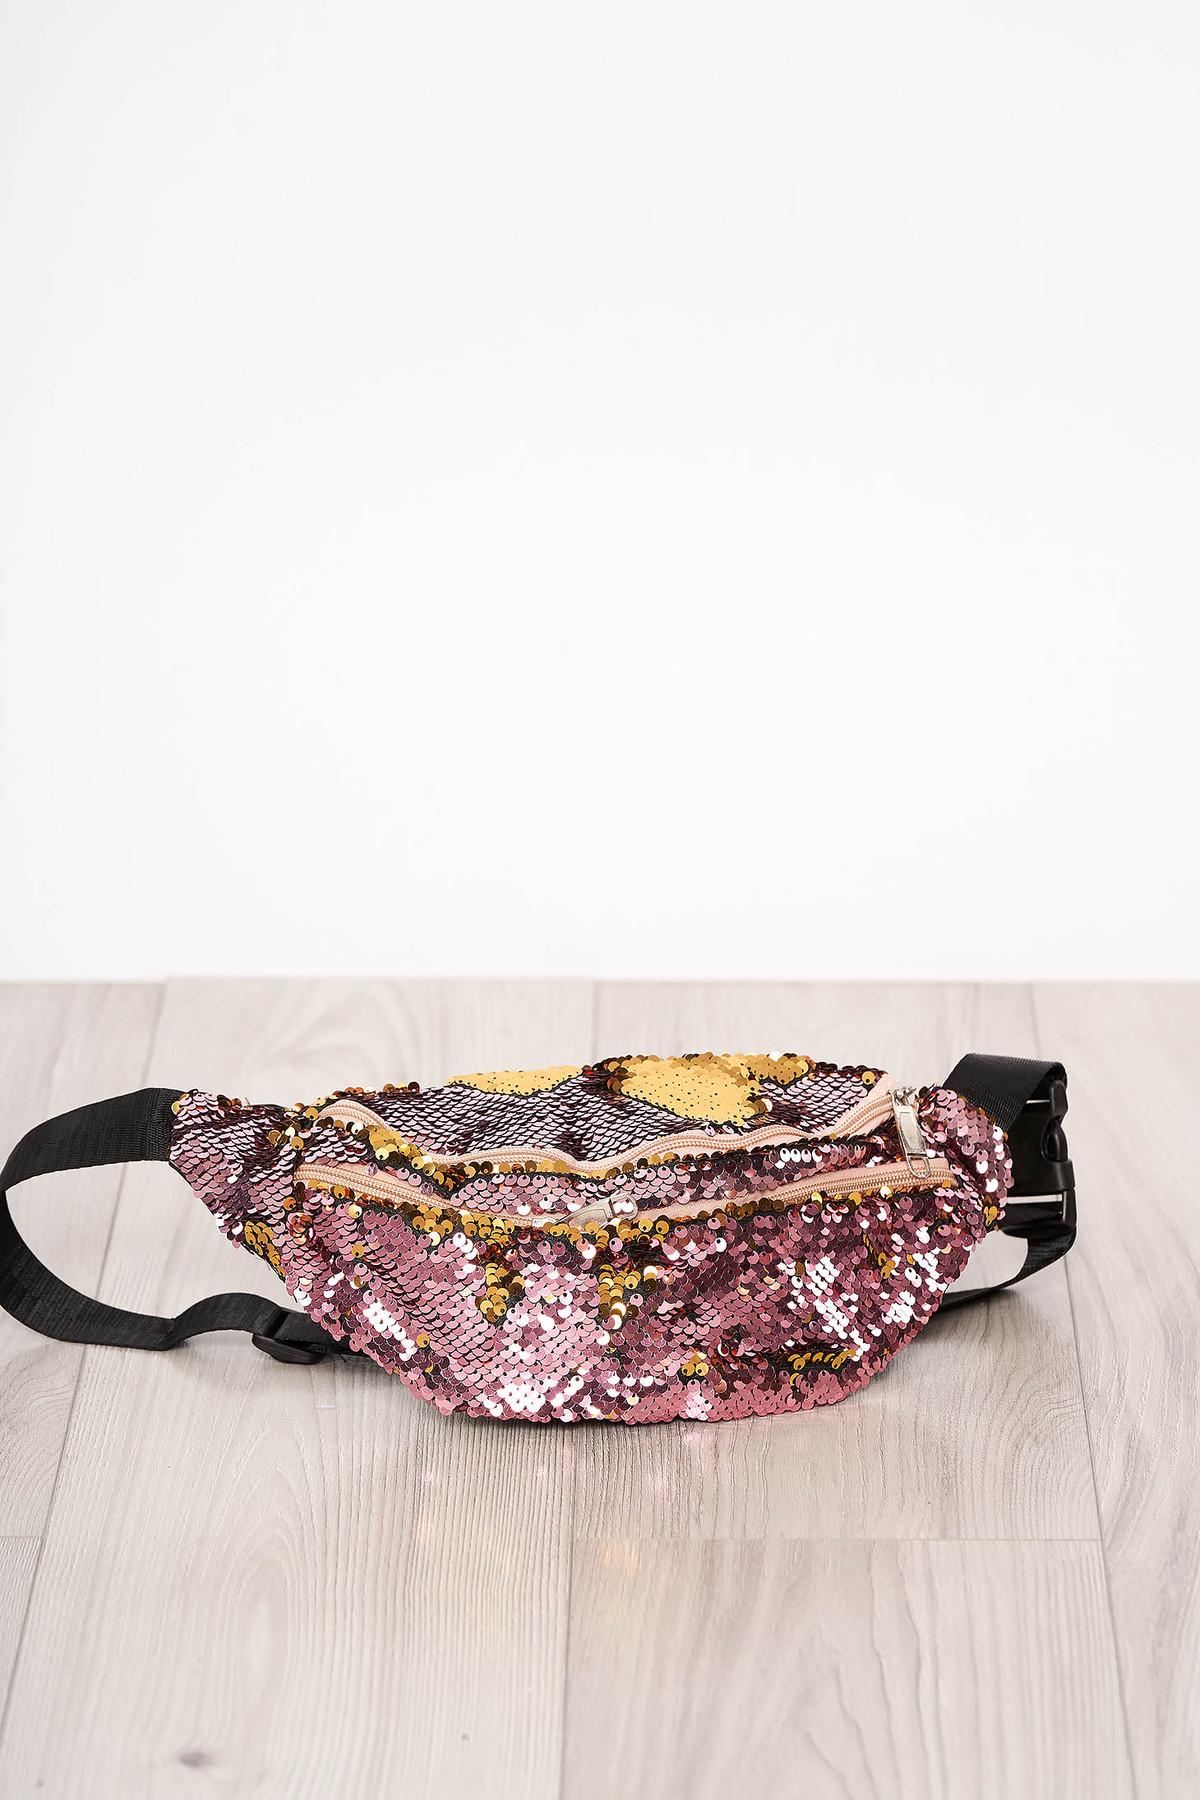 Geanta dama SunShine roz cu aplicatii cu paiete accesorizata cu fermoar cu maner lung reglabil